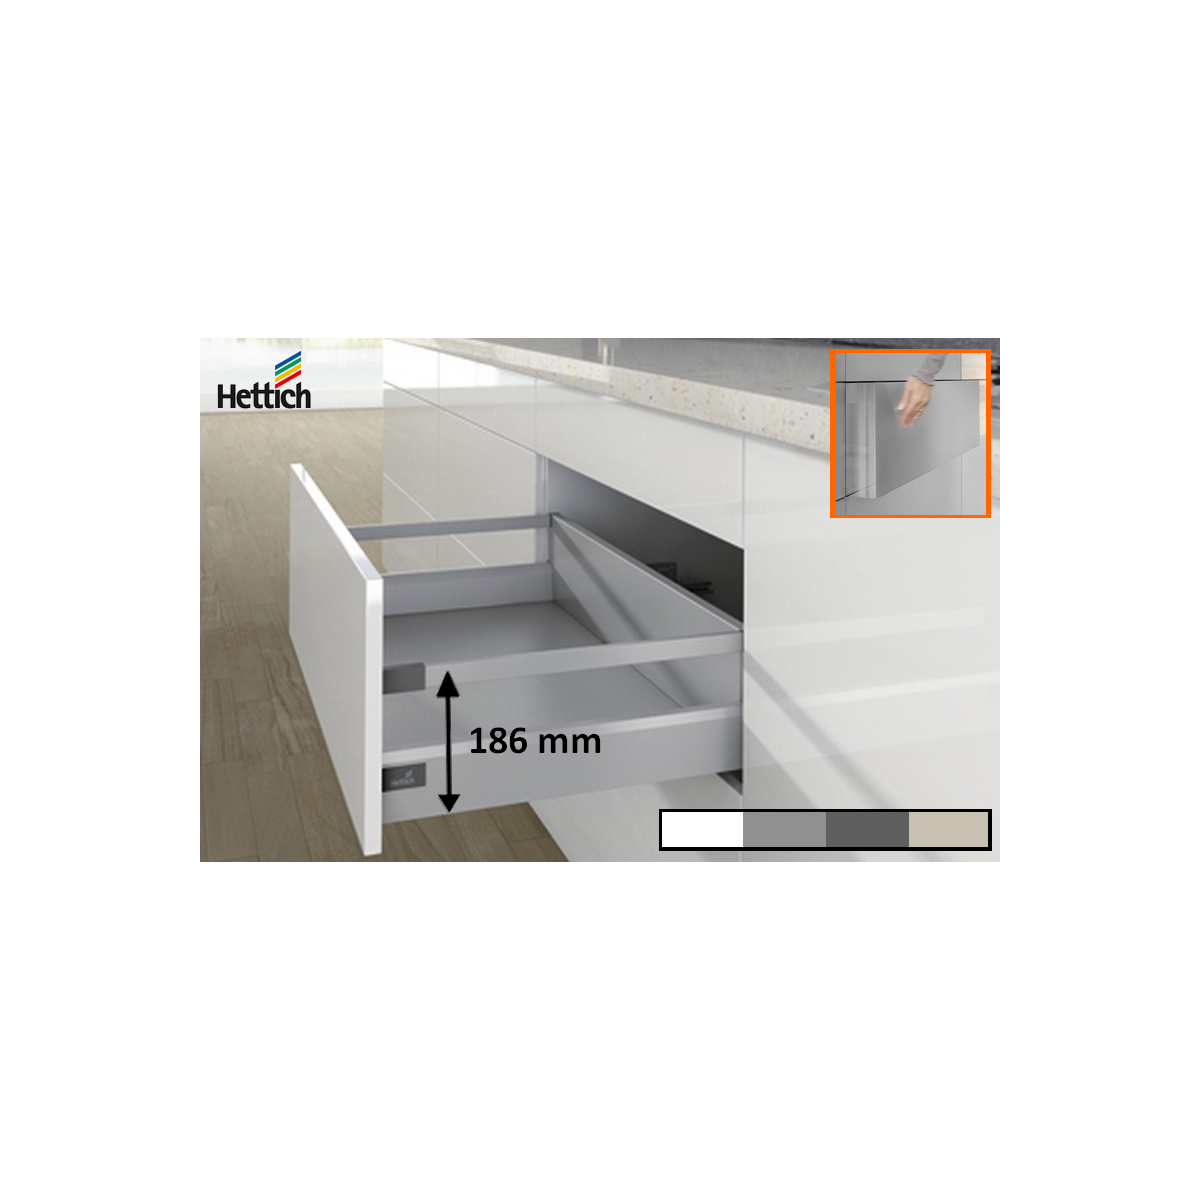 Kit tiroir casserolier Hettich Hauteur 186mm